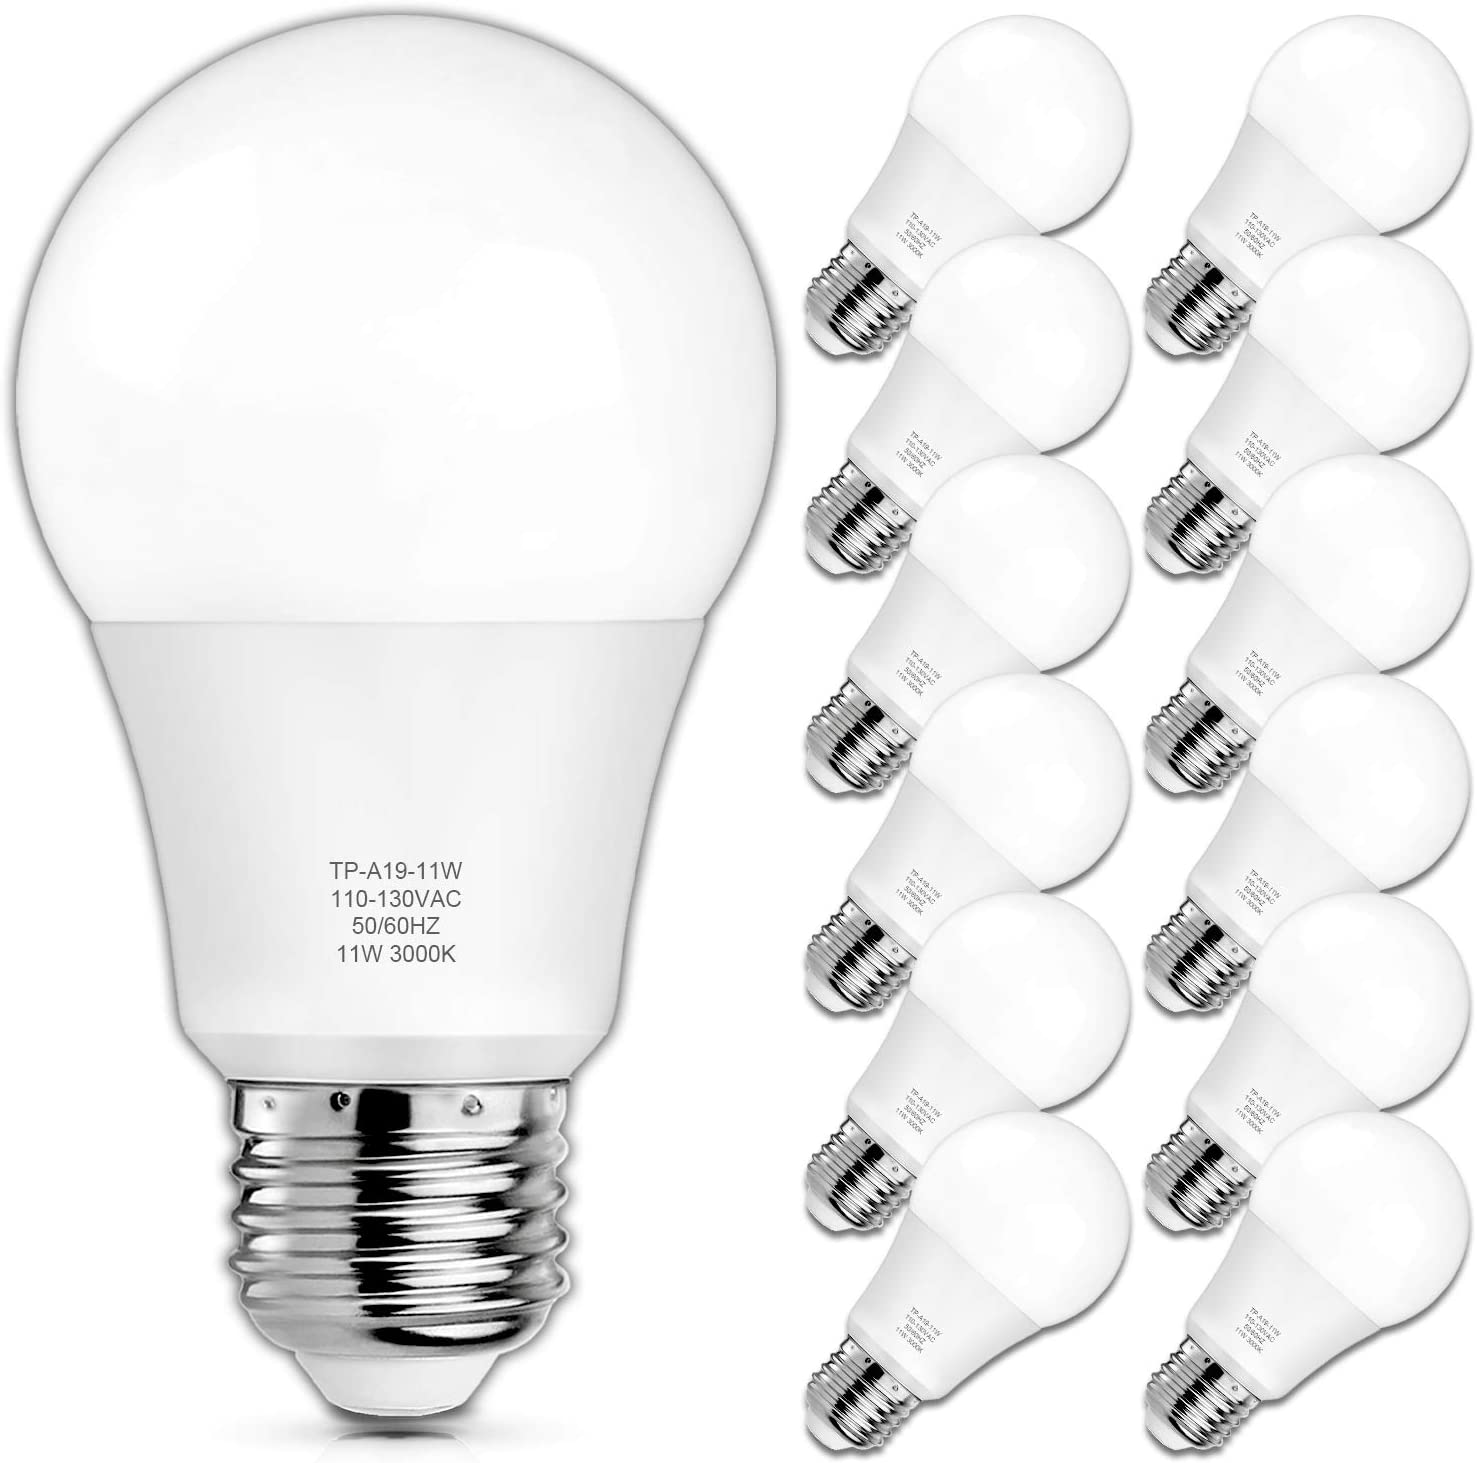 Amazon Com A19 Led Light Bulbs 100 Watt Equivalent Led Bulbs 3000k Soft White 1100 Lumens Standard E26 Medium Screw Base Cri 85 25000 Hours Lifespan No Flicker Non Dimmable Pack Of 12 Home Improvement